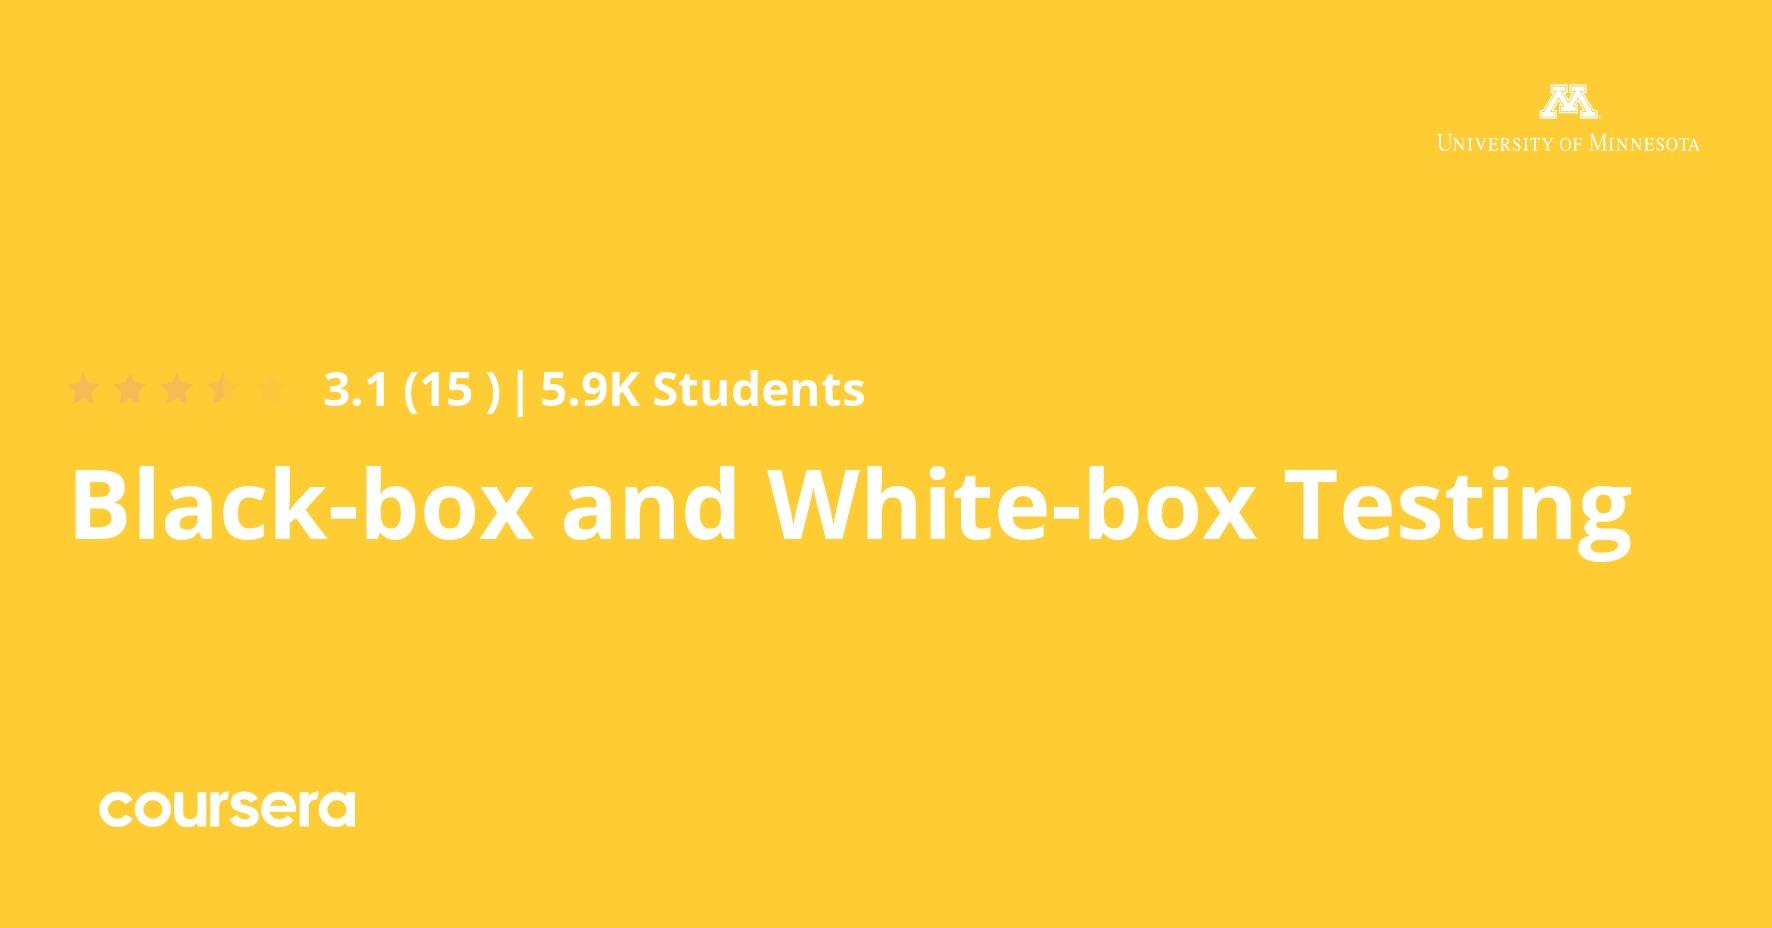 Black-box and White-box Testing